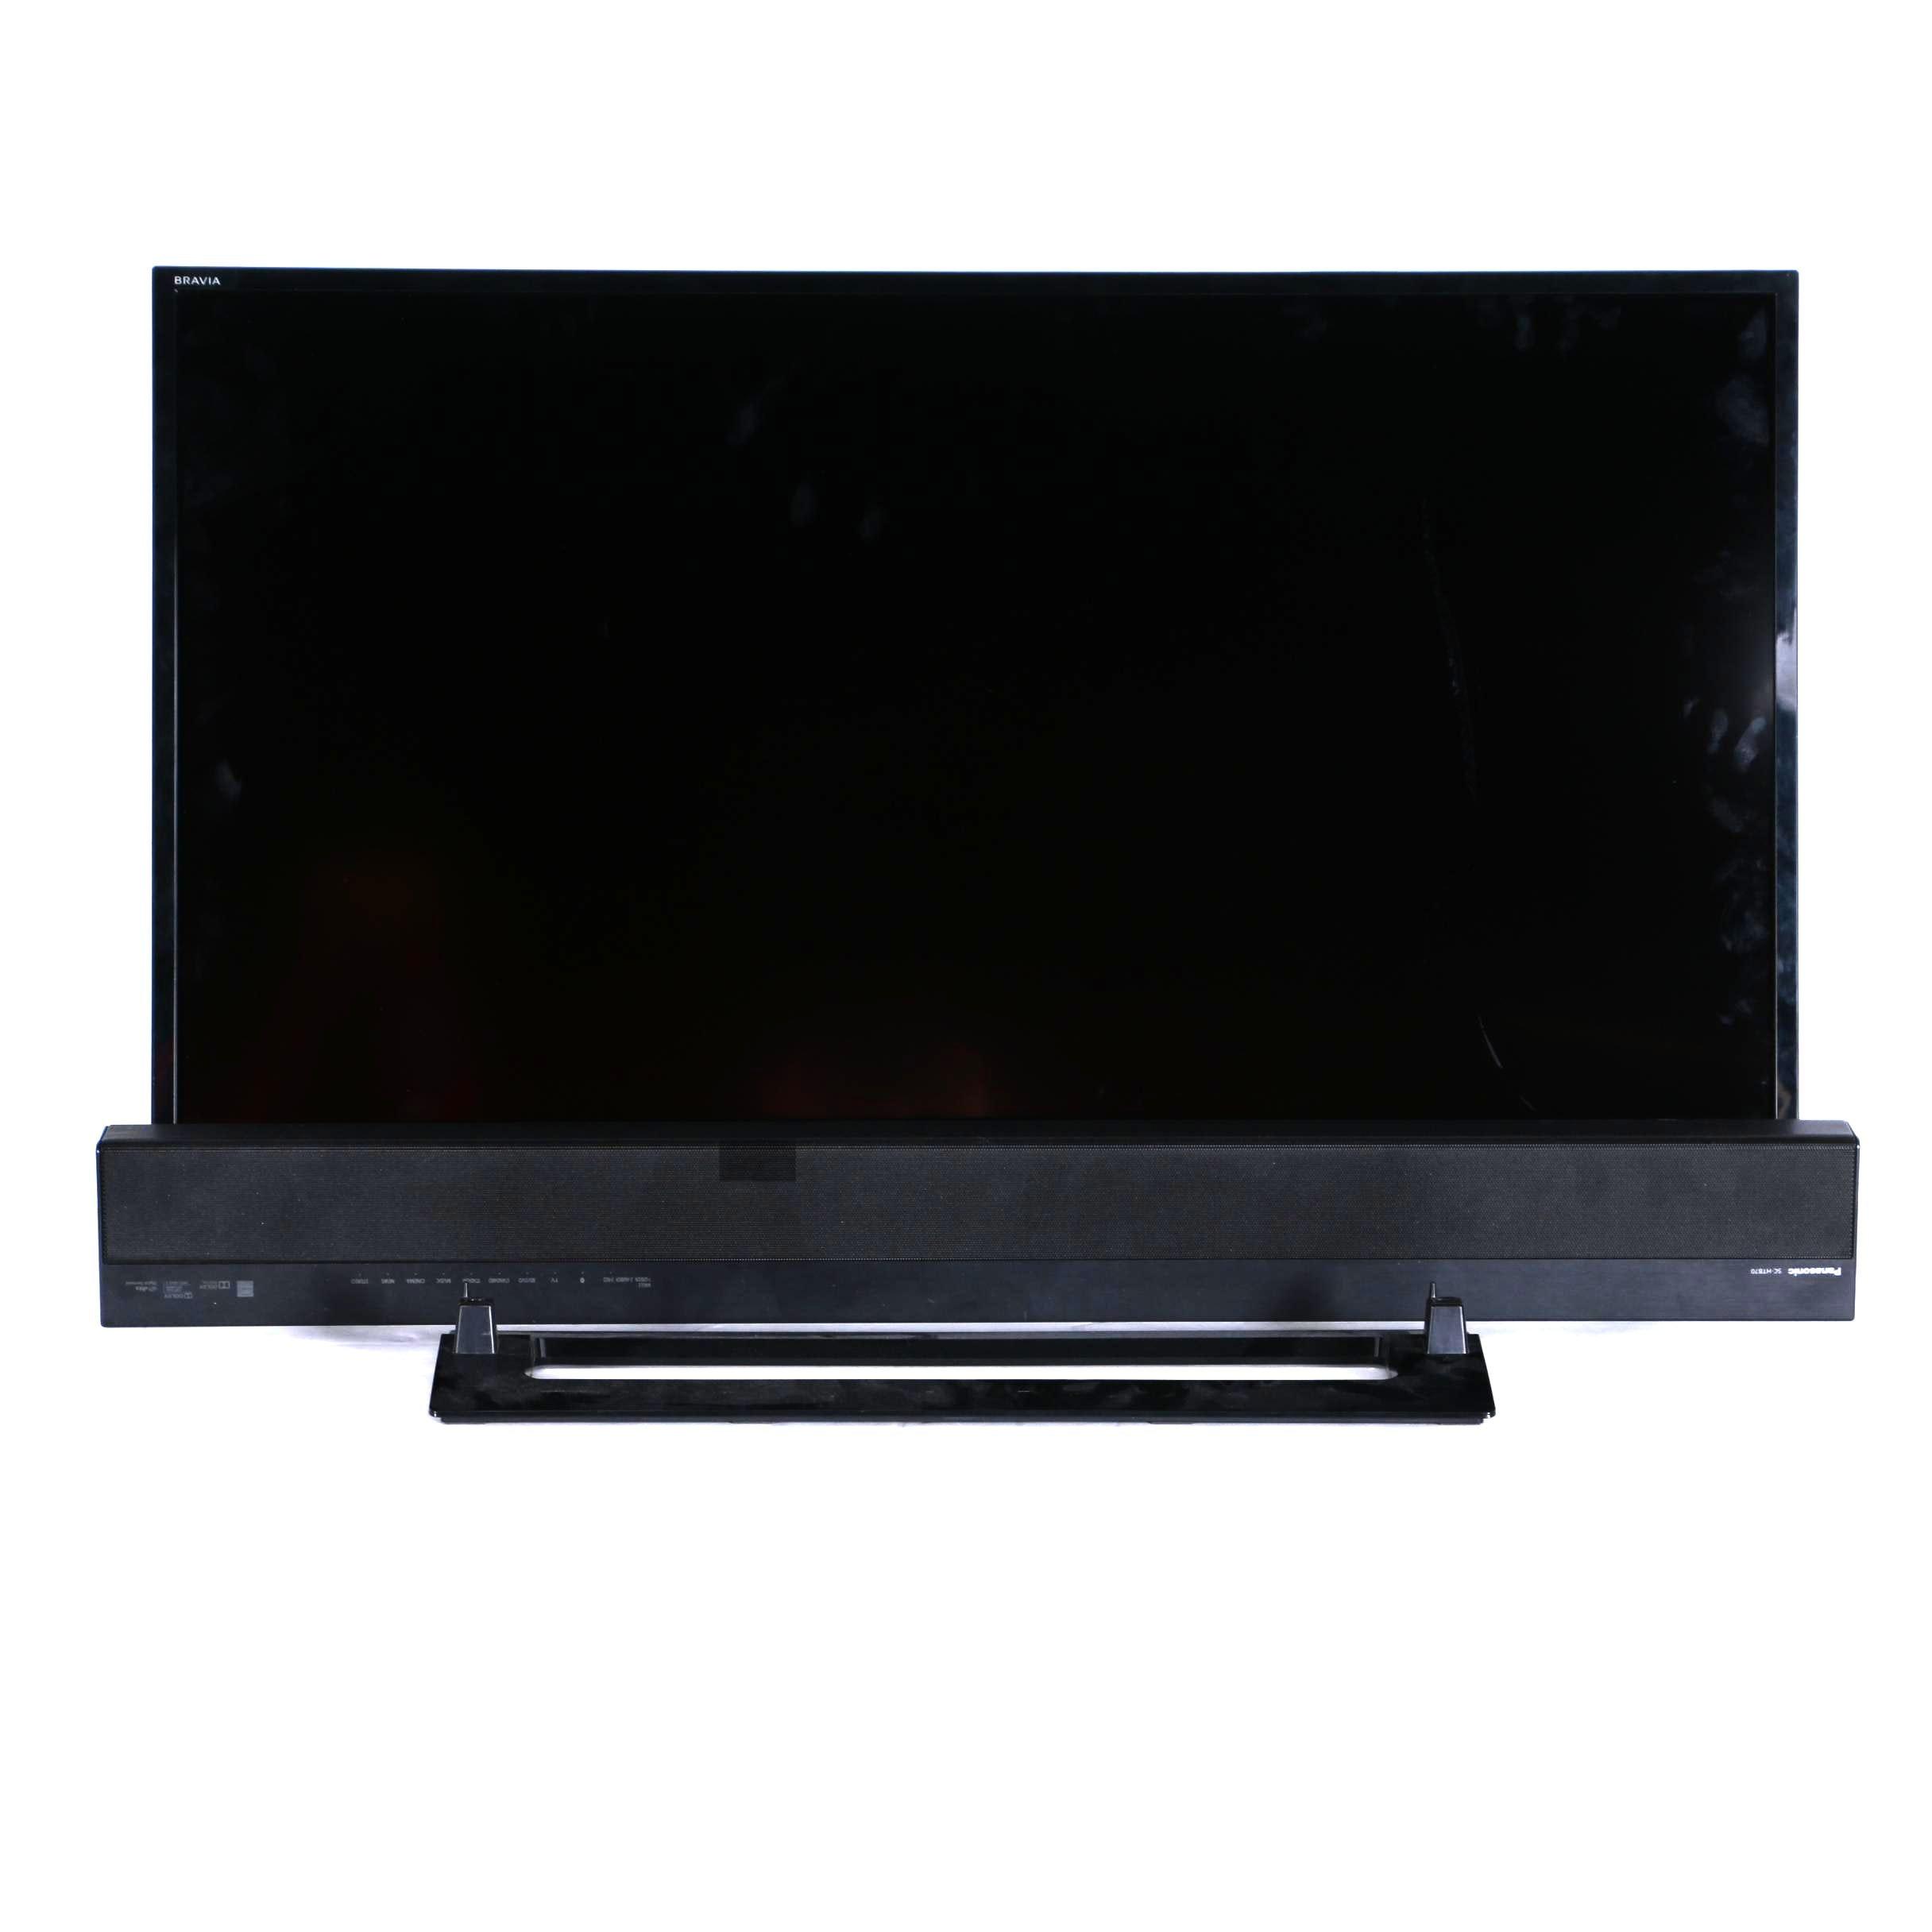 "Sony 40"" LED HDTV and Panasonic Sound Bar"